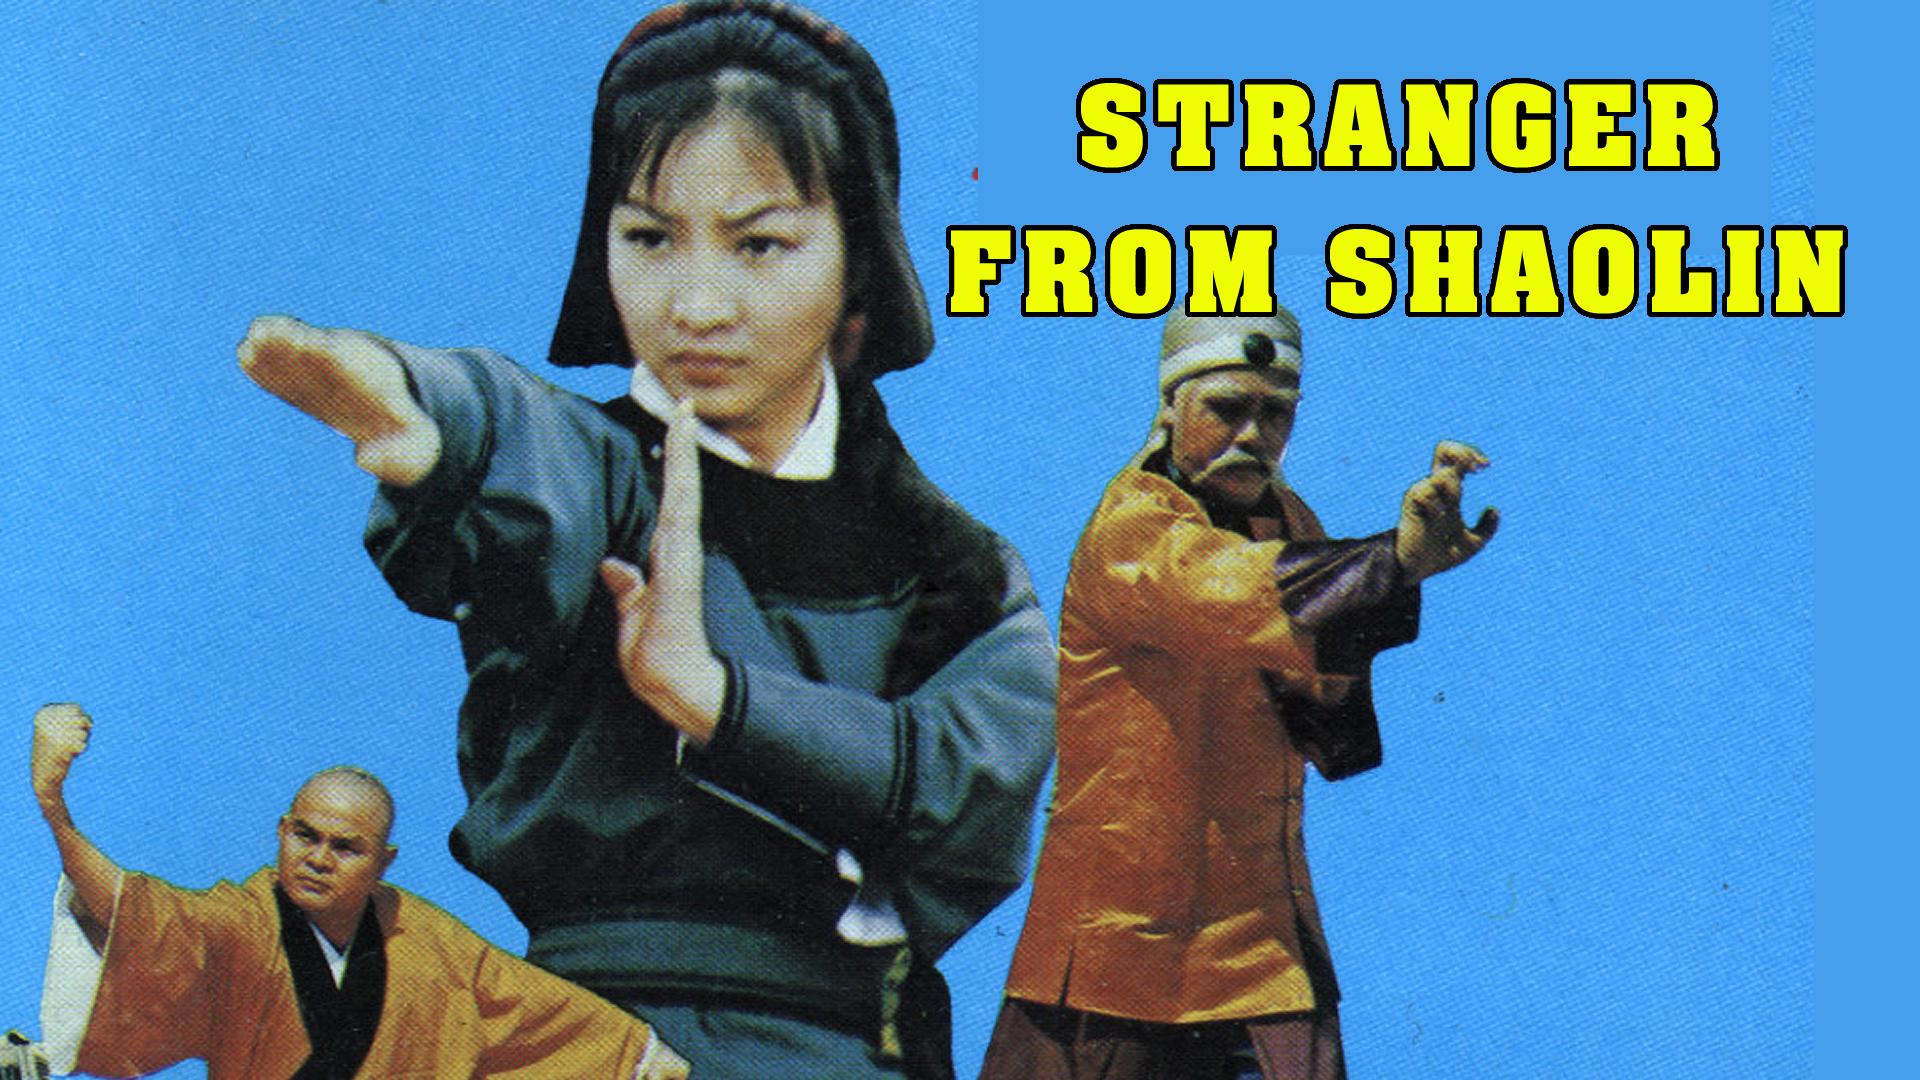 Stranger from Shaolin